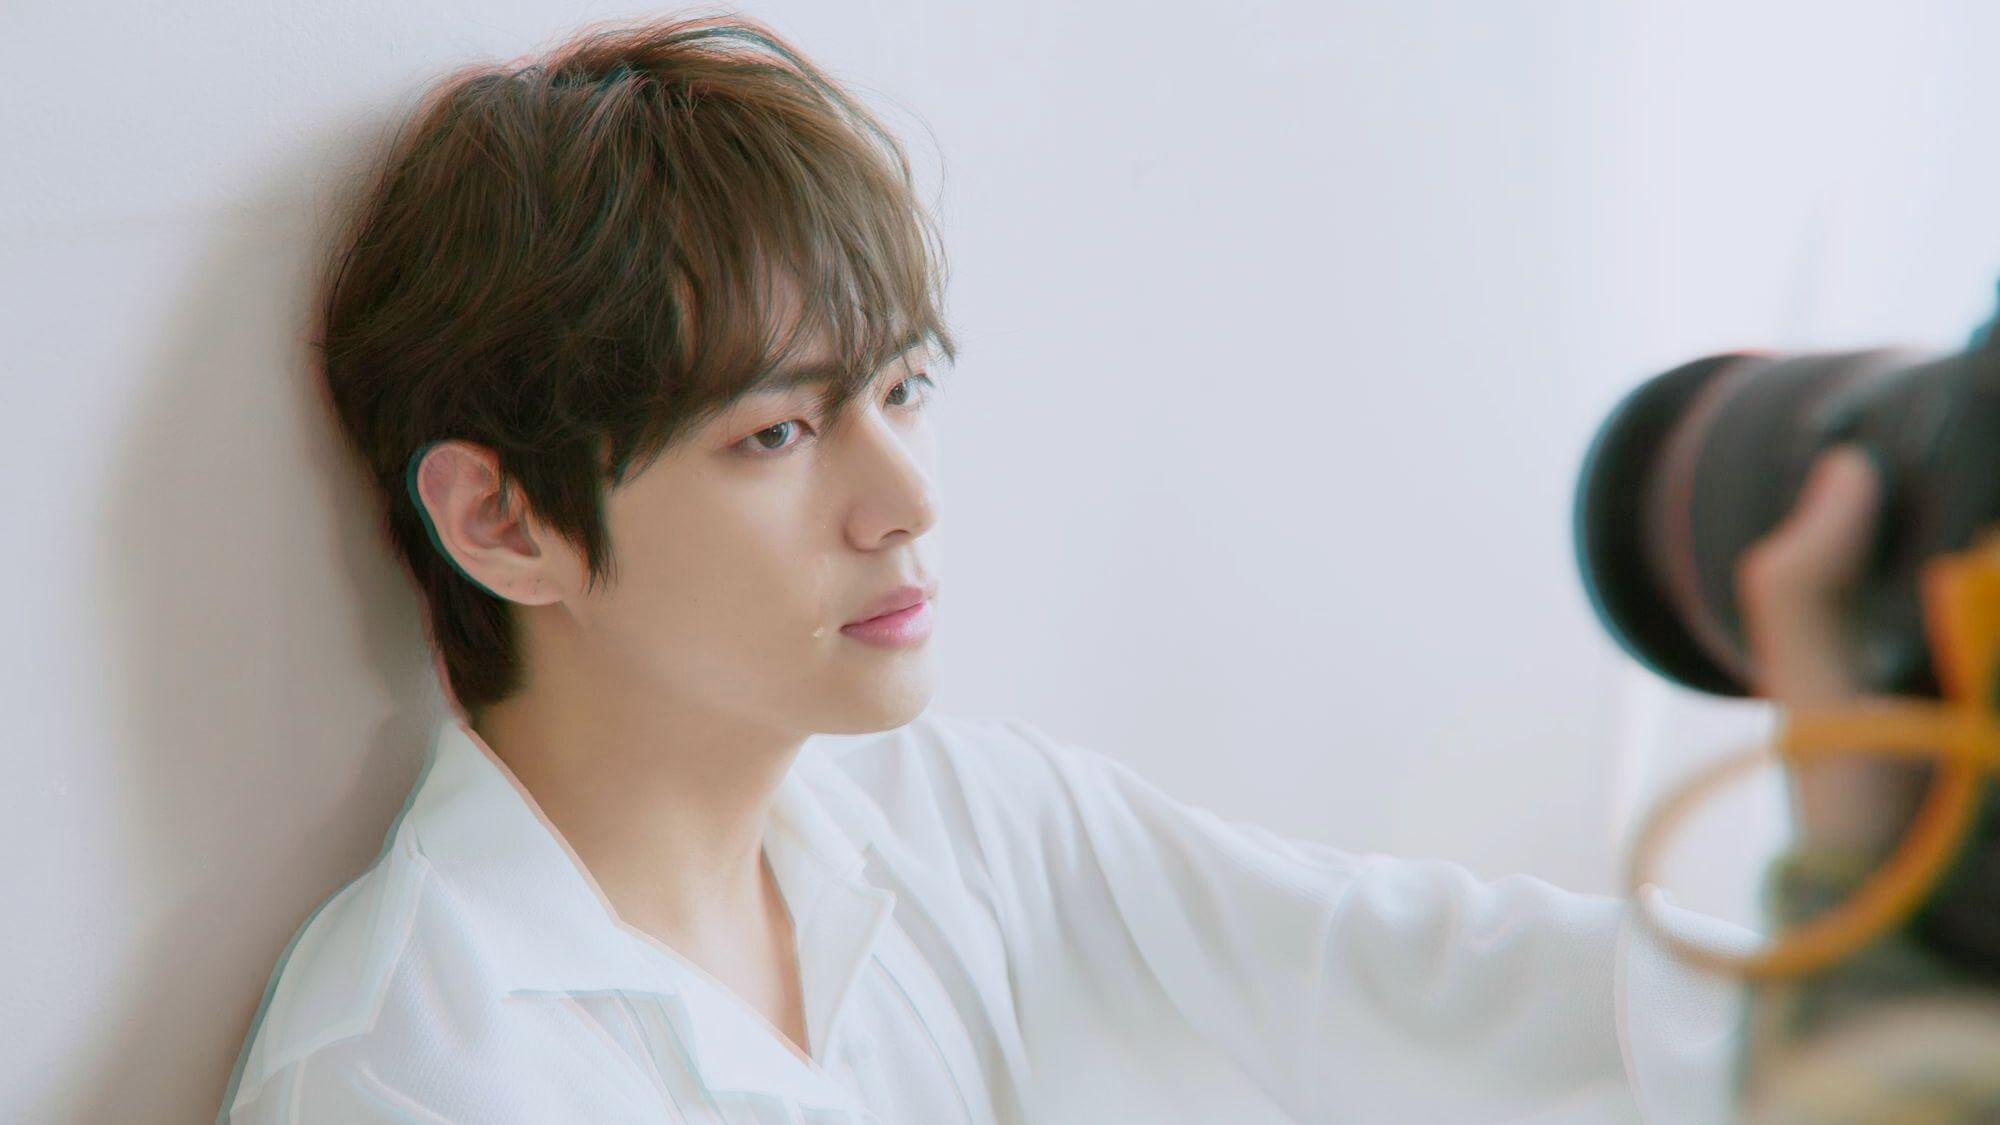 V Taehyung Bts Wallpaper Hd For Pc Kpop Elizawerner Cr Elizawerner Taehyung Bts Taehyung Kim Taehyung Bts taehyung wallpaper pc